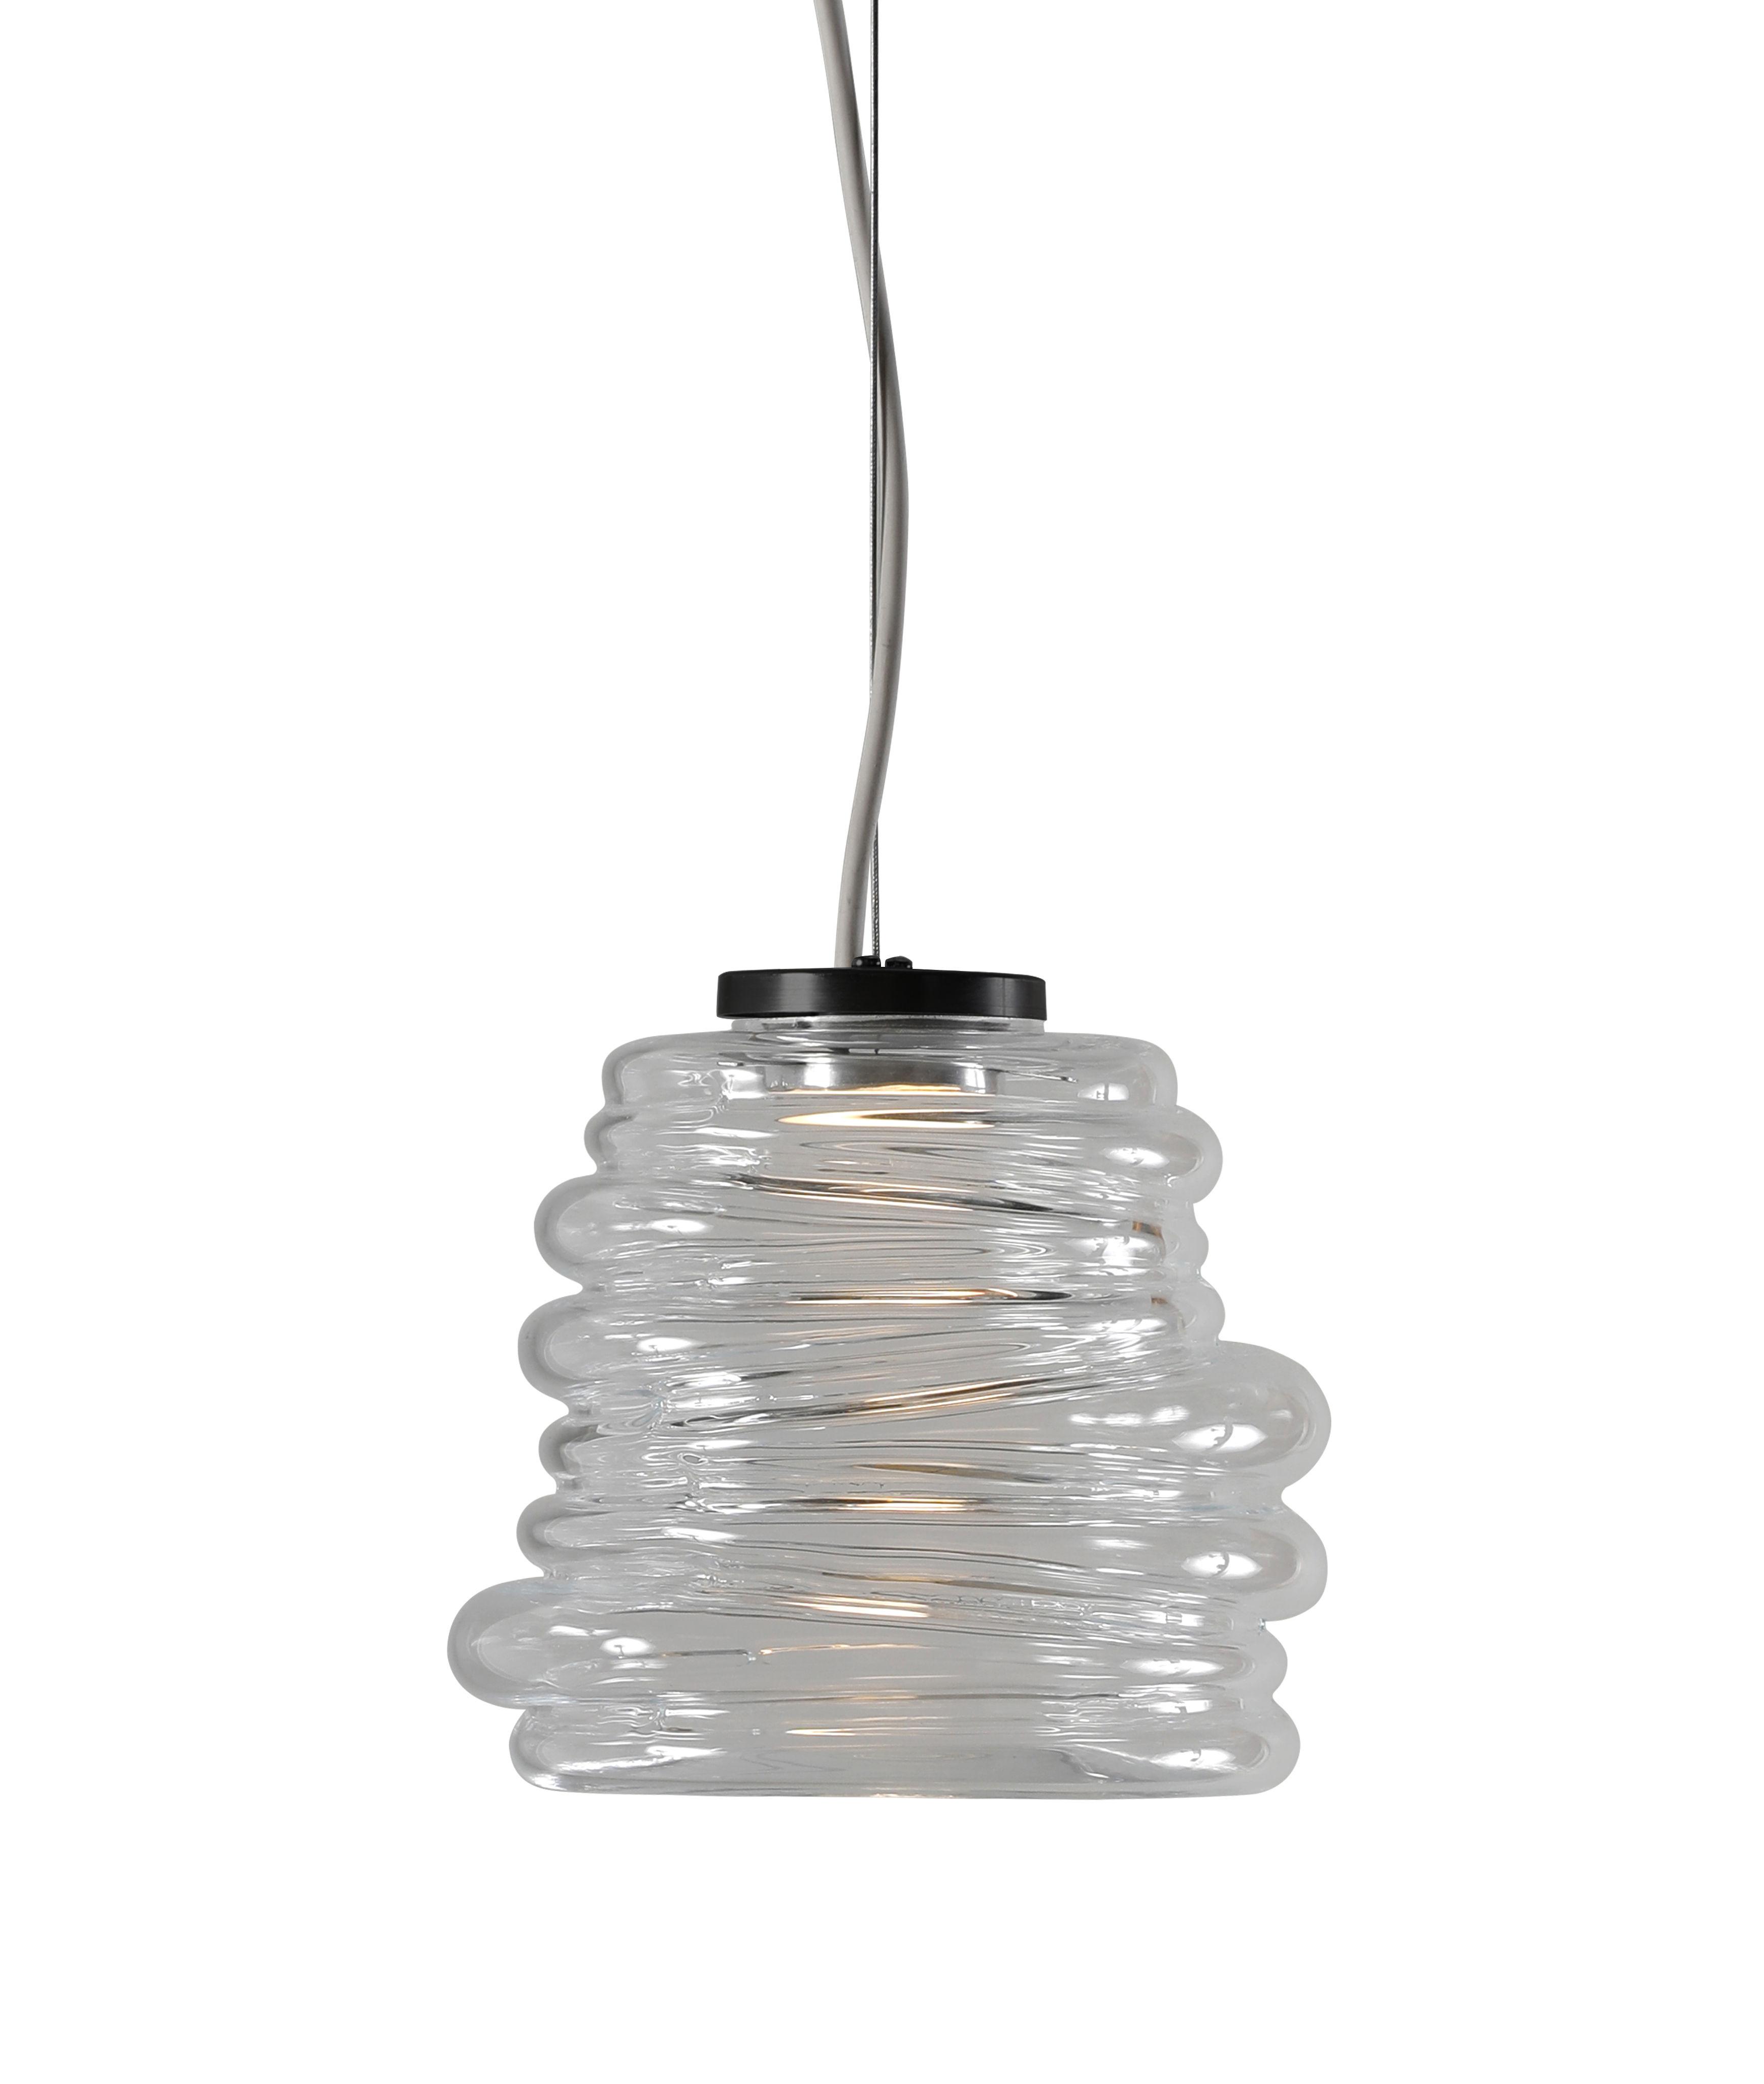 Illuminazione - Lampadari - Sospensione Bibendum LED - / Ø 15 cm - Vetro di Karman - Trasparente - Vetro